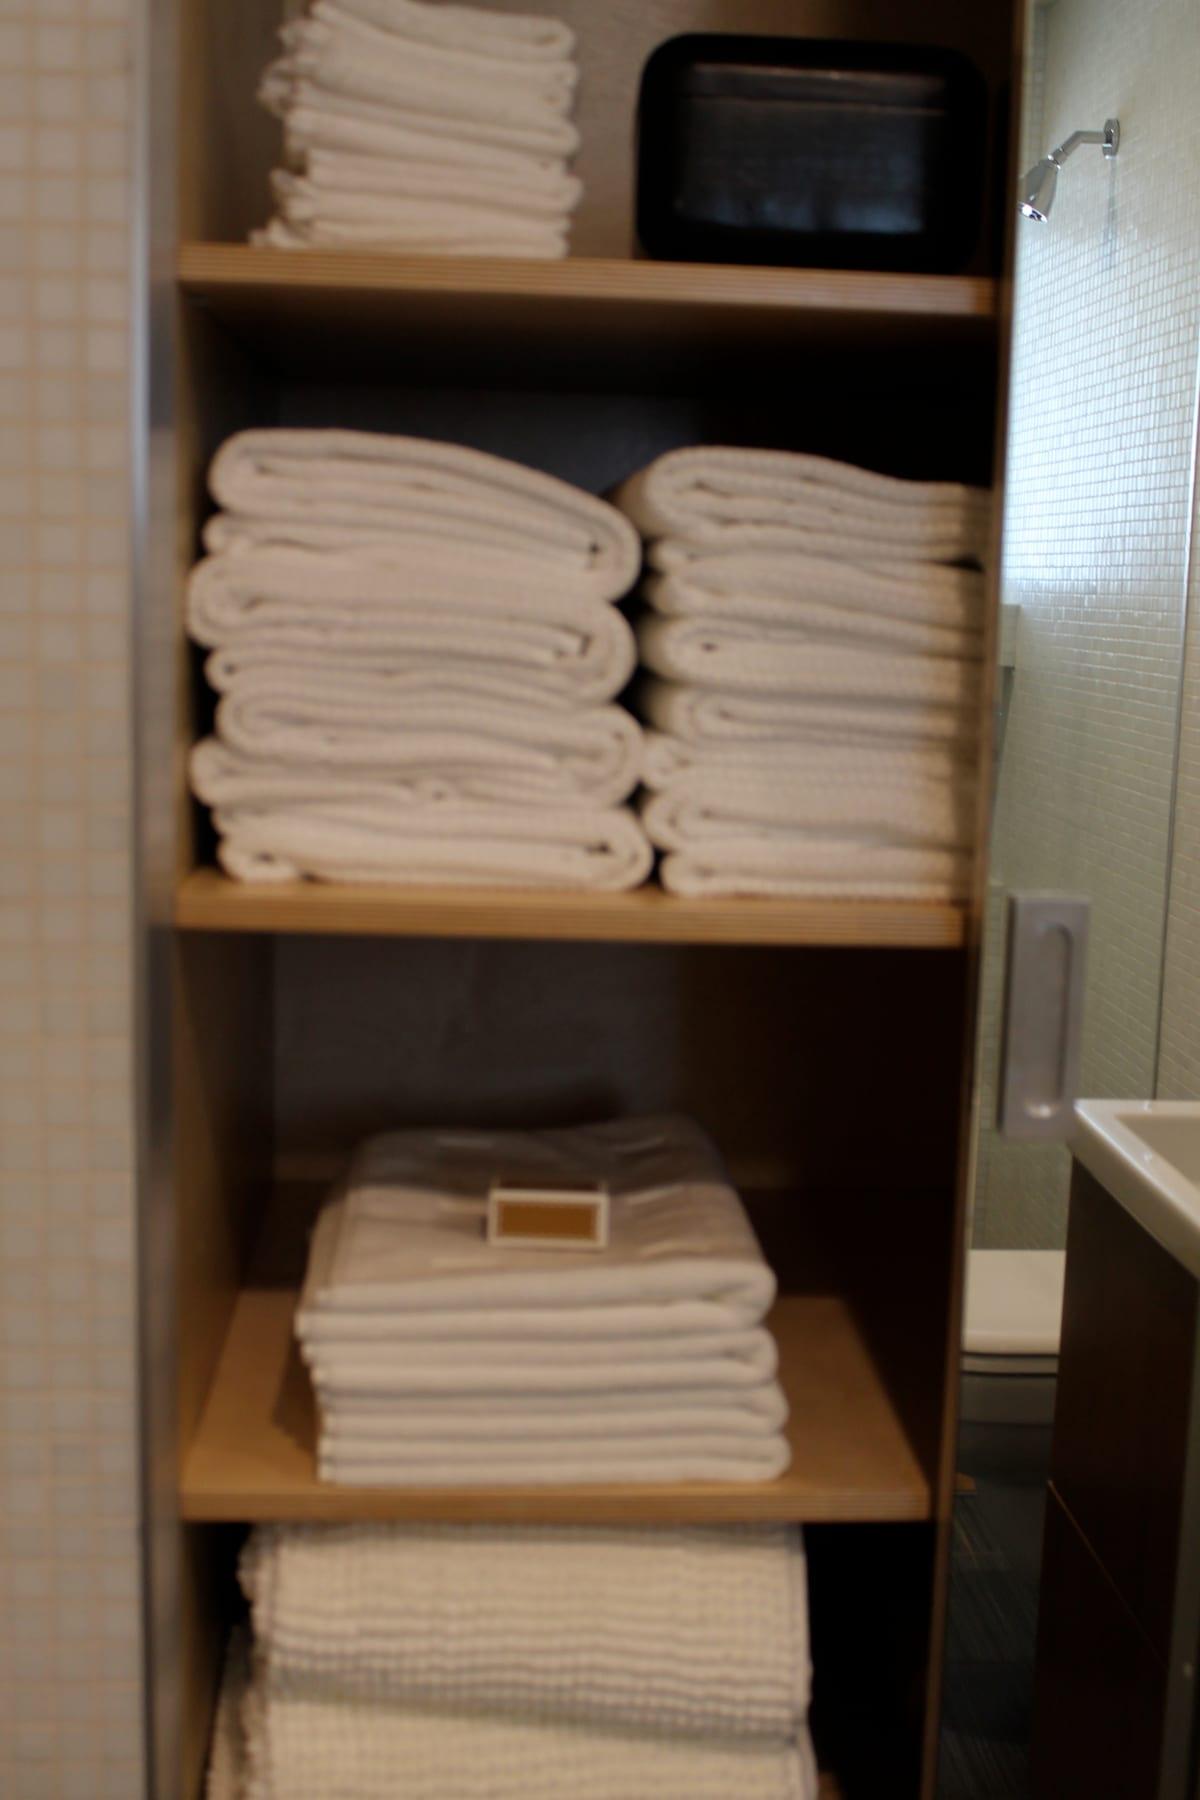 Plenty of clean towels and bath mats